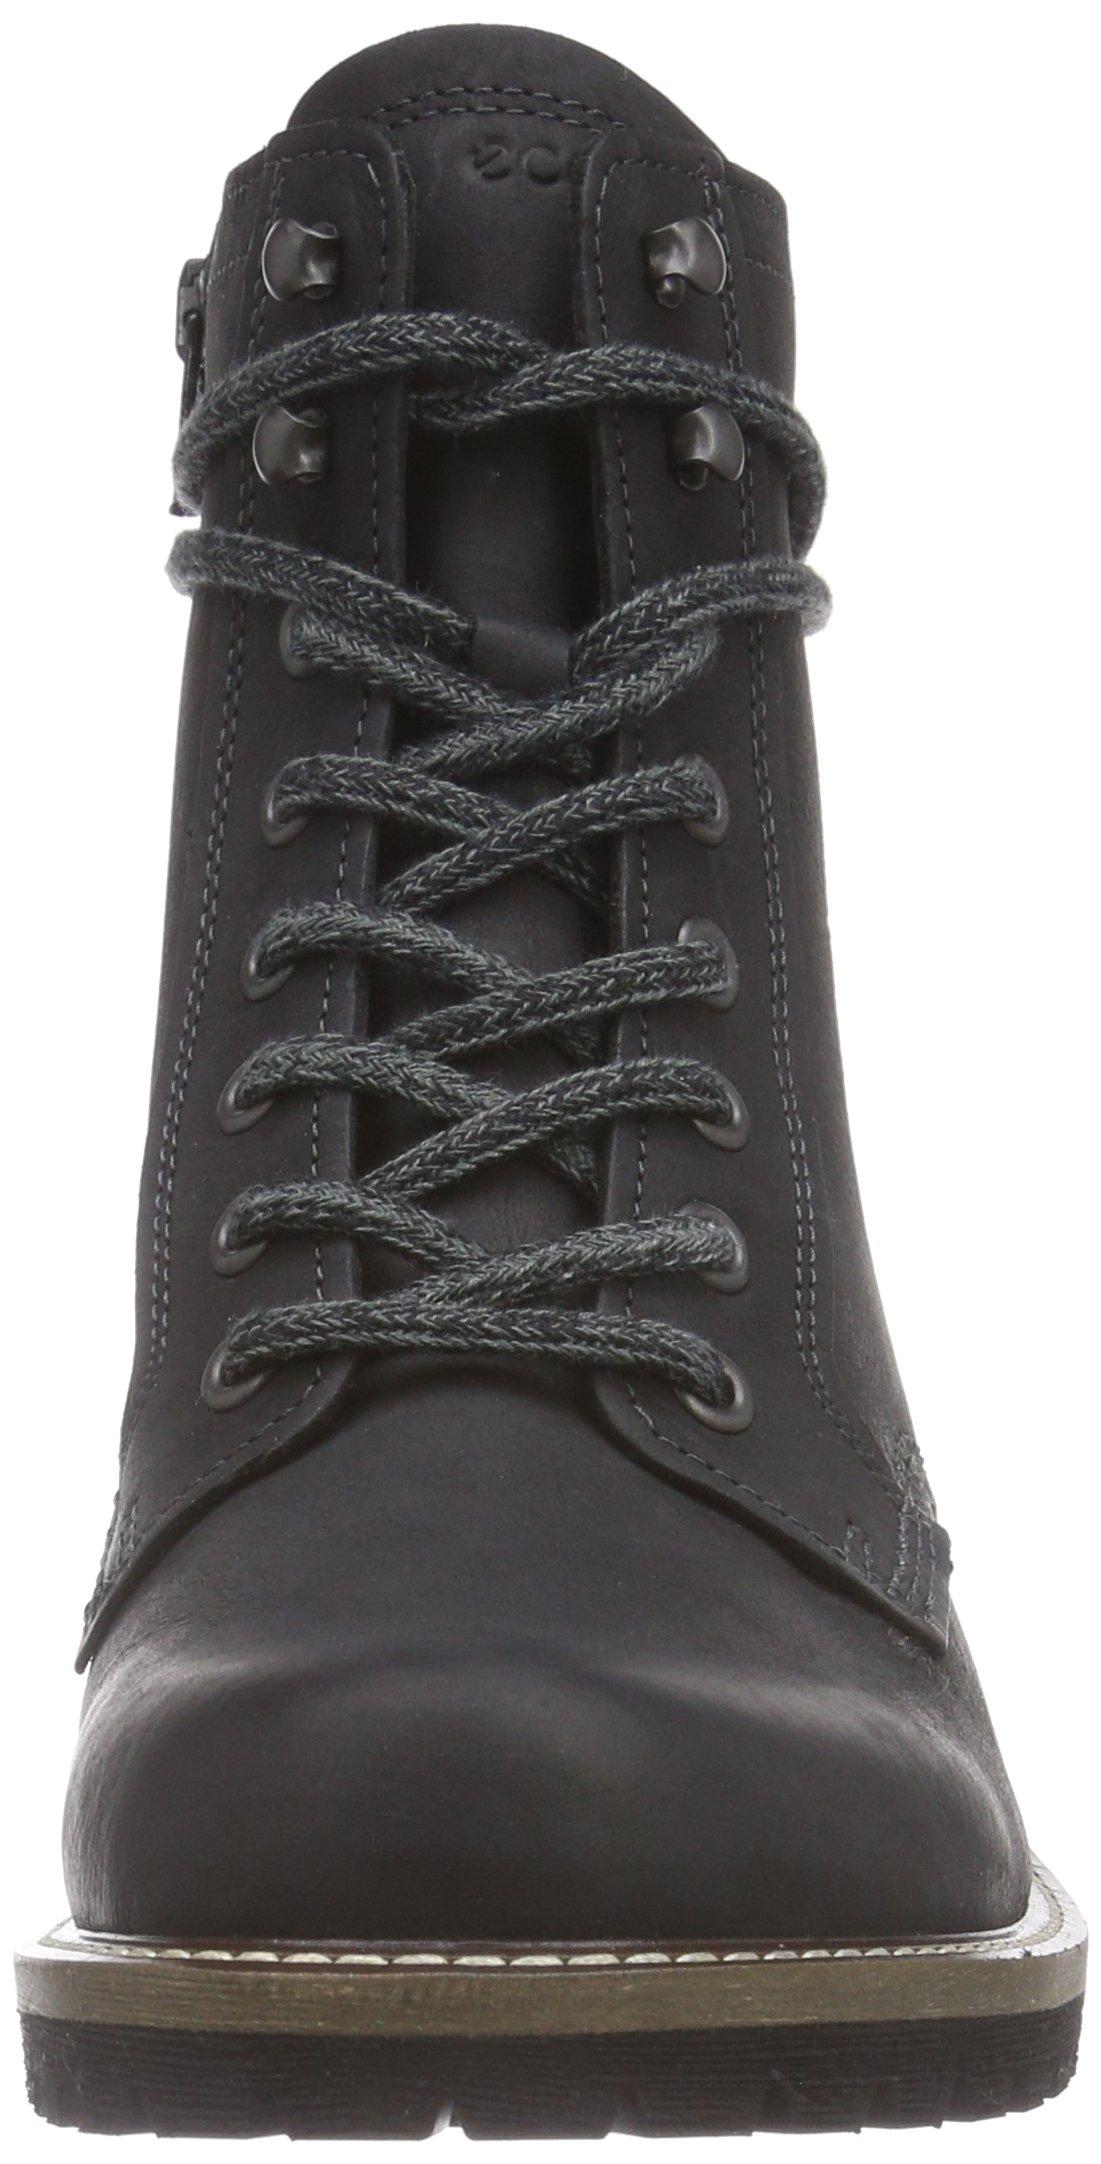 Ecco Footwear Womens Elaine Boot, Black, 37 EU/6-6.5 M US by ECCO (Image #4)